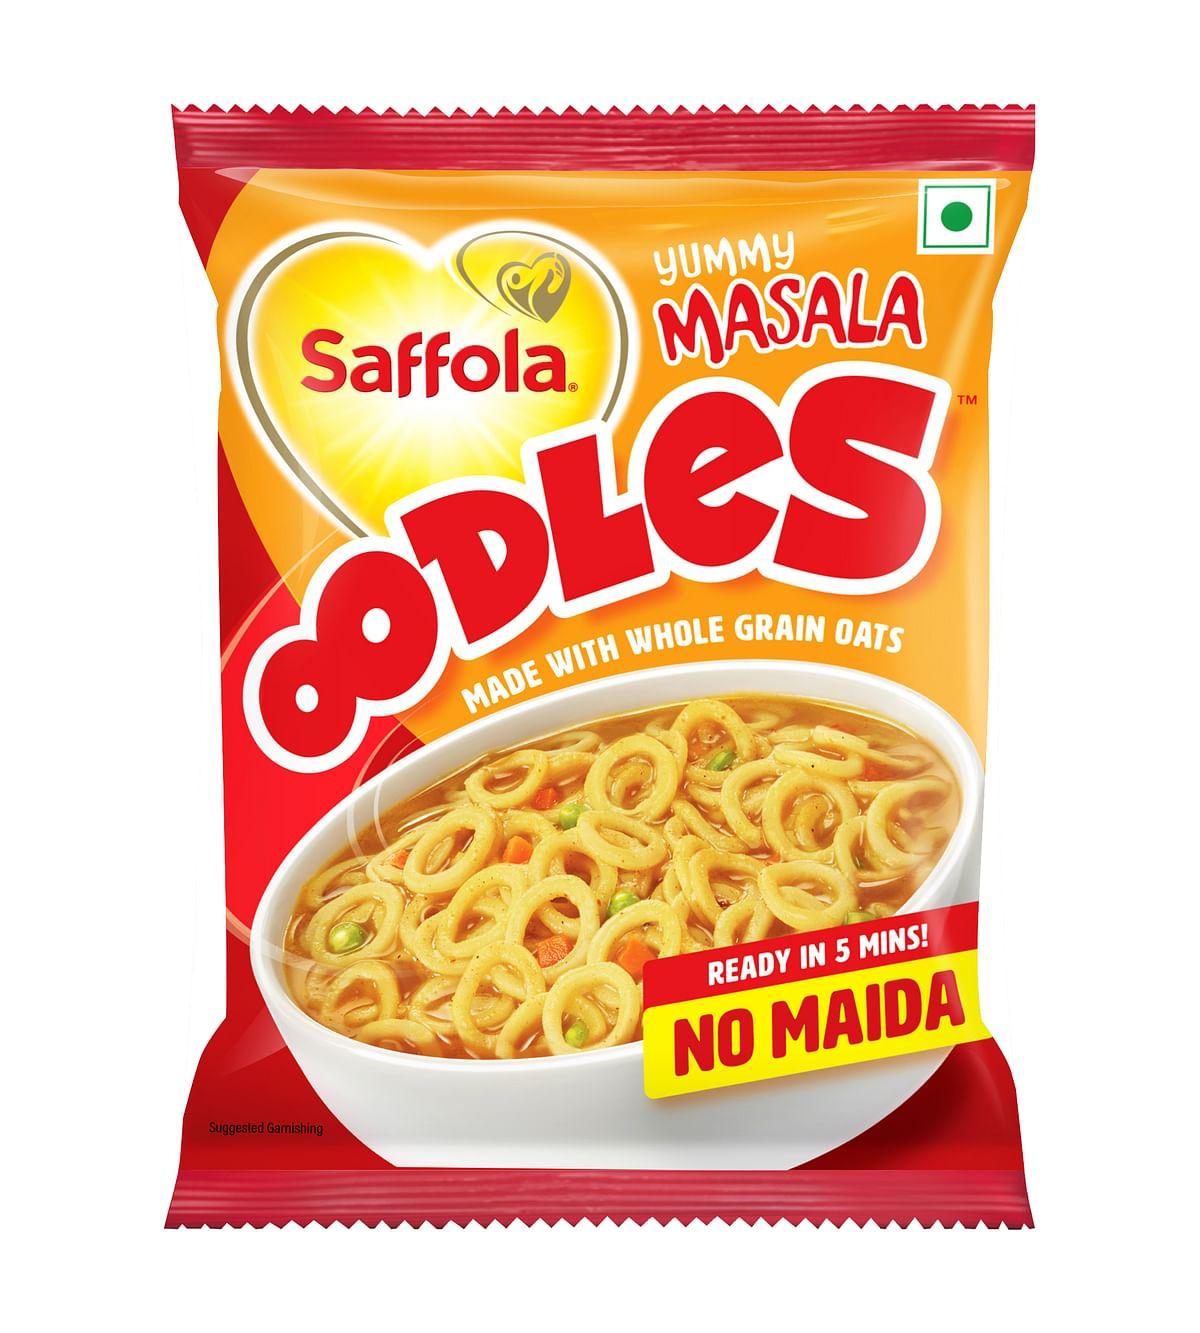 Saffola's Oodles. (Source: Marico Ltd.)